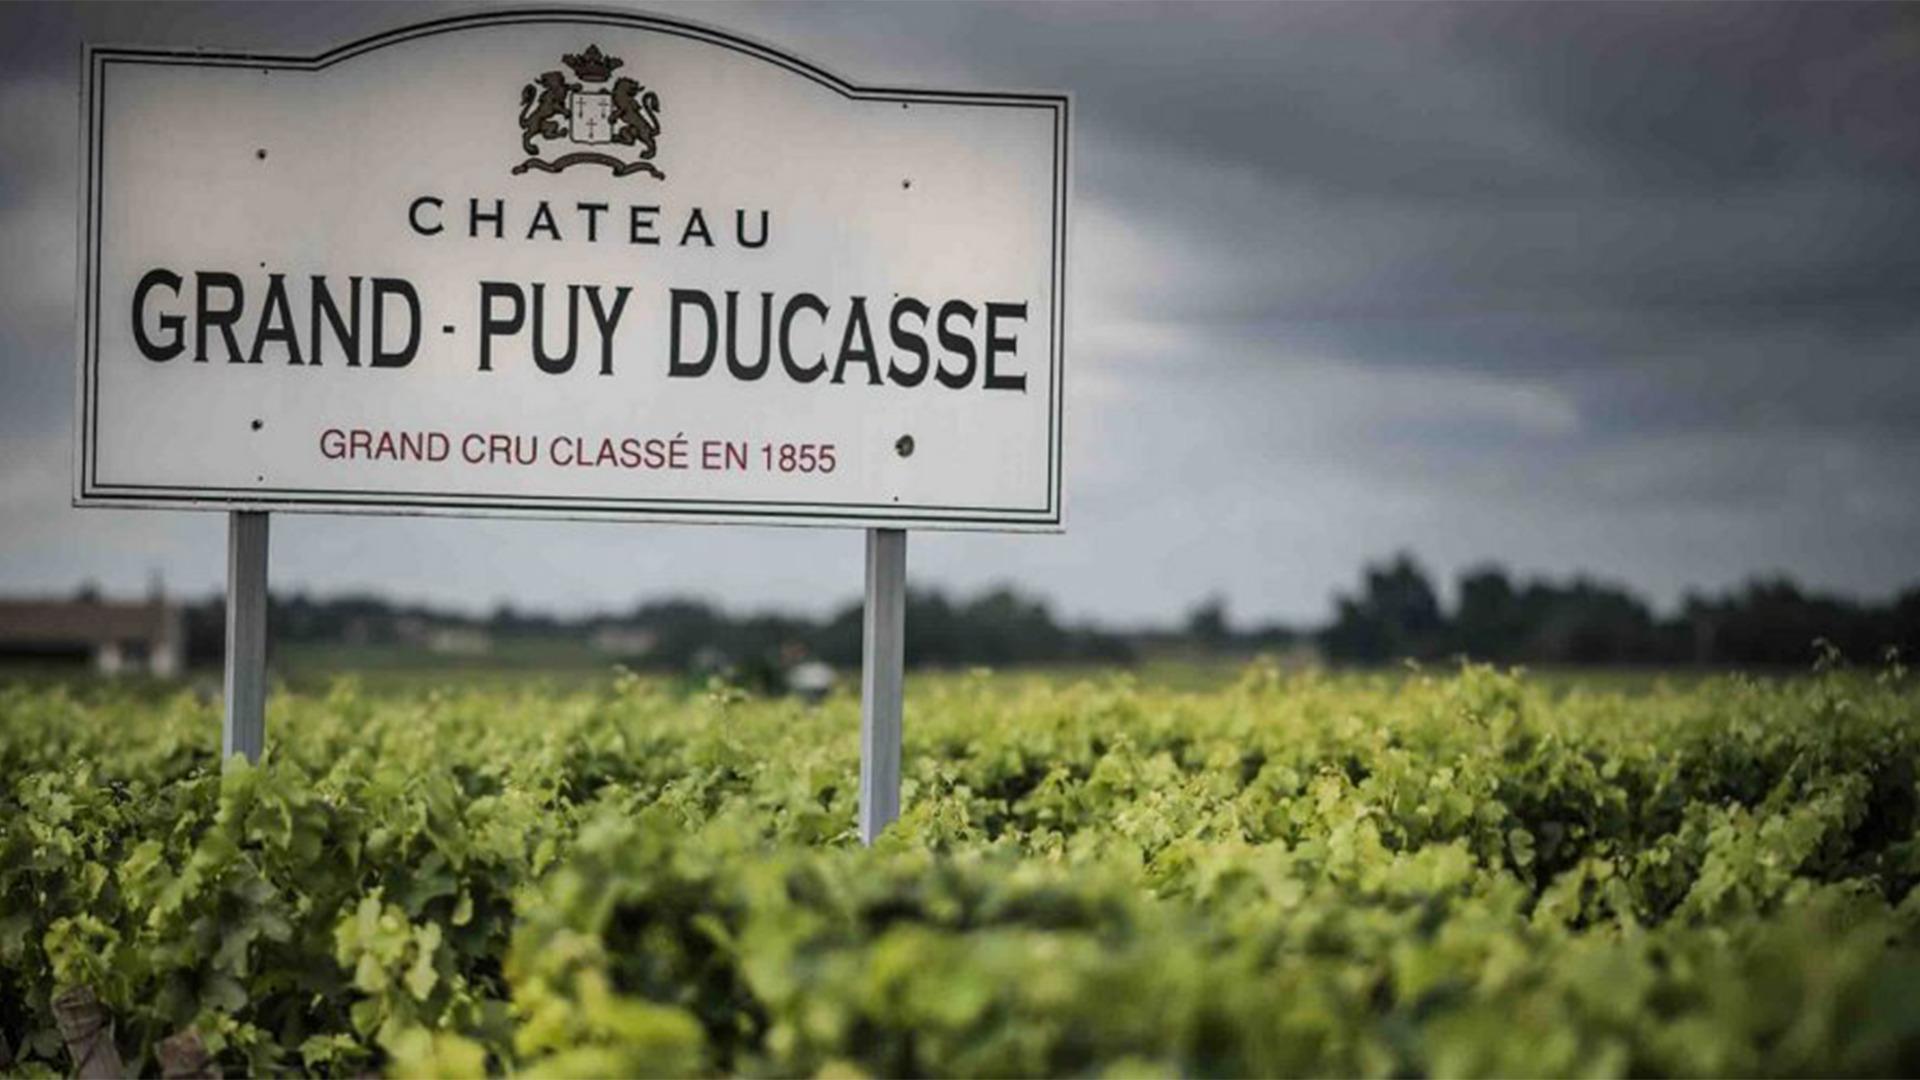 Rượu Vang Chateau Grand-Puy Ducasse